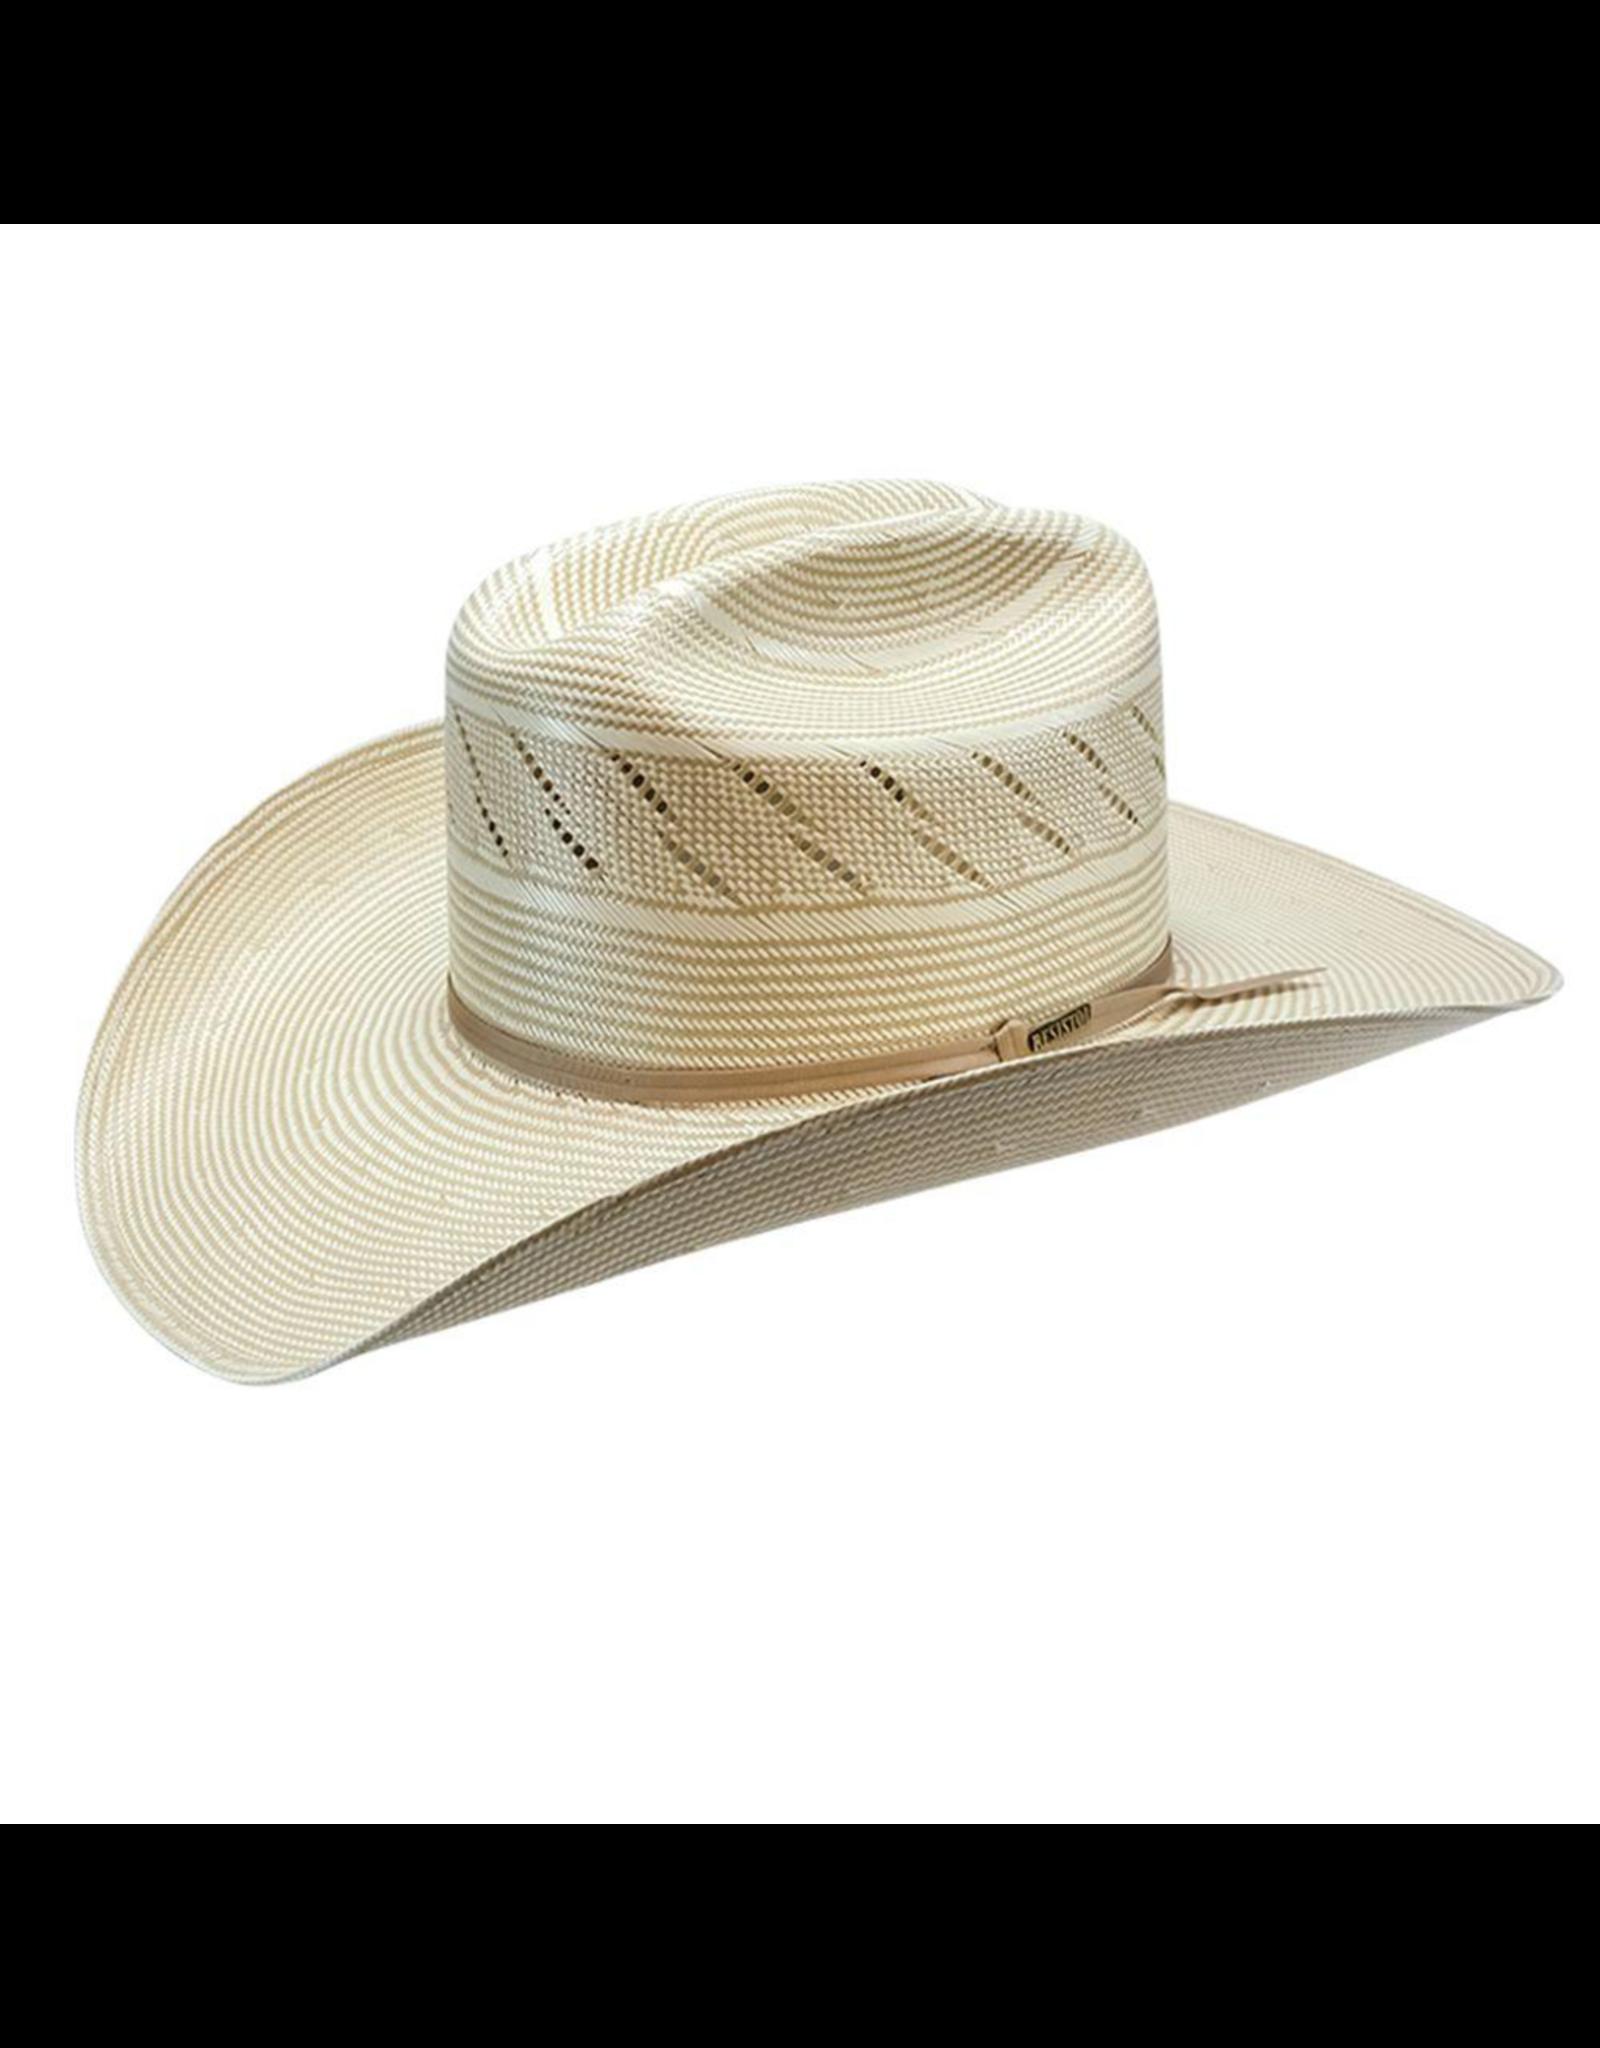 Stetson Hats Resistol 20X Wheat Ridge Straw Hat